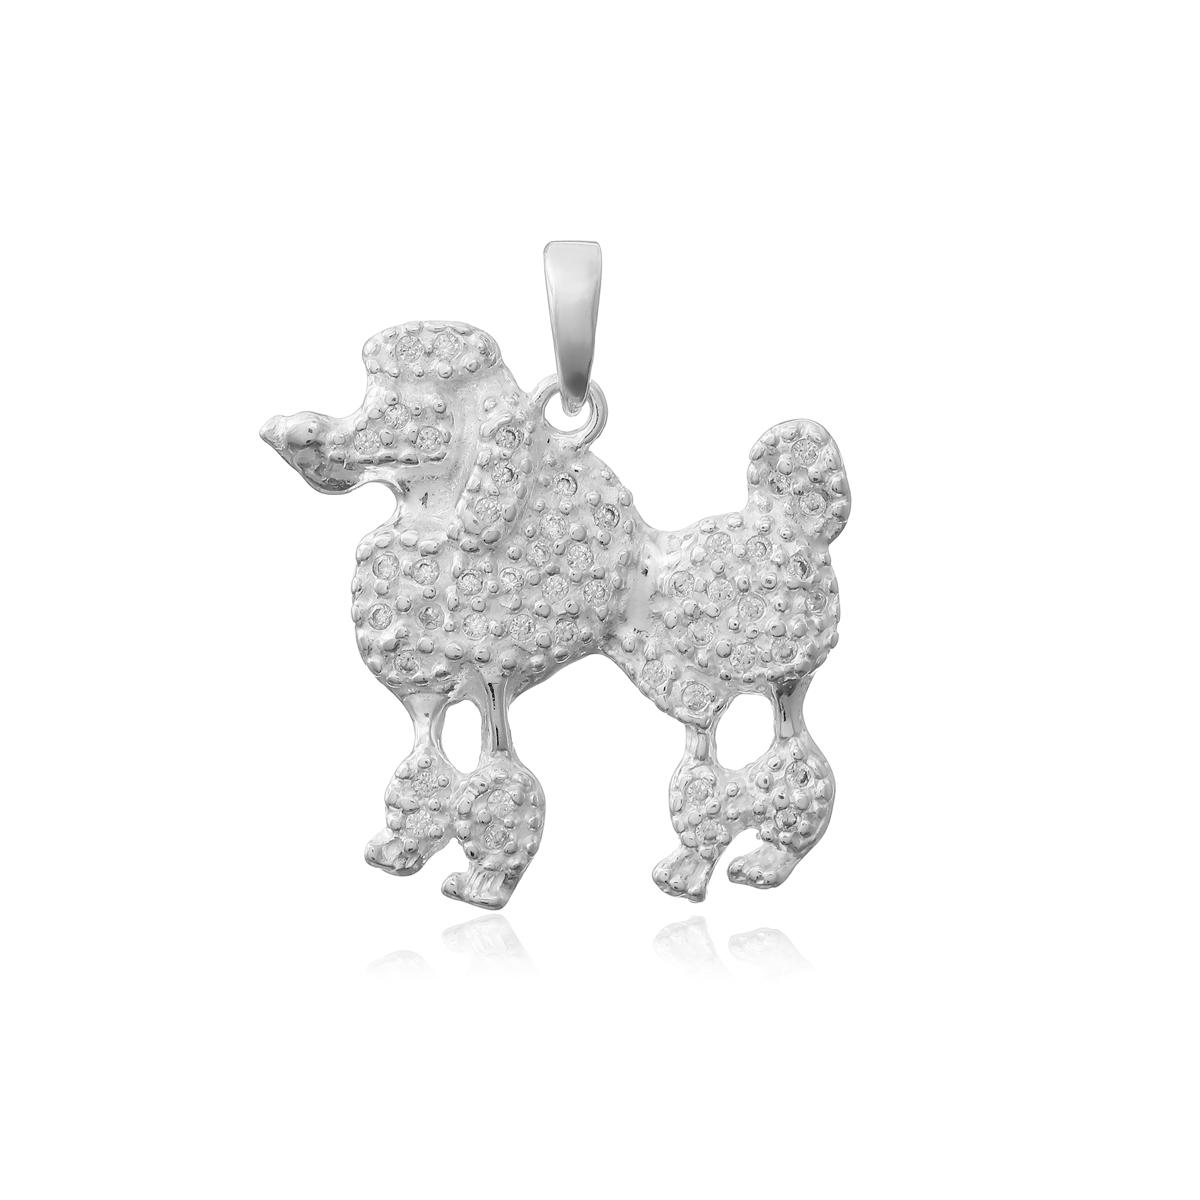 Pingente Prata 925, Cachorro Cravejado